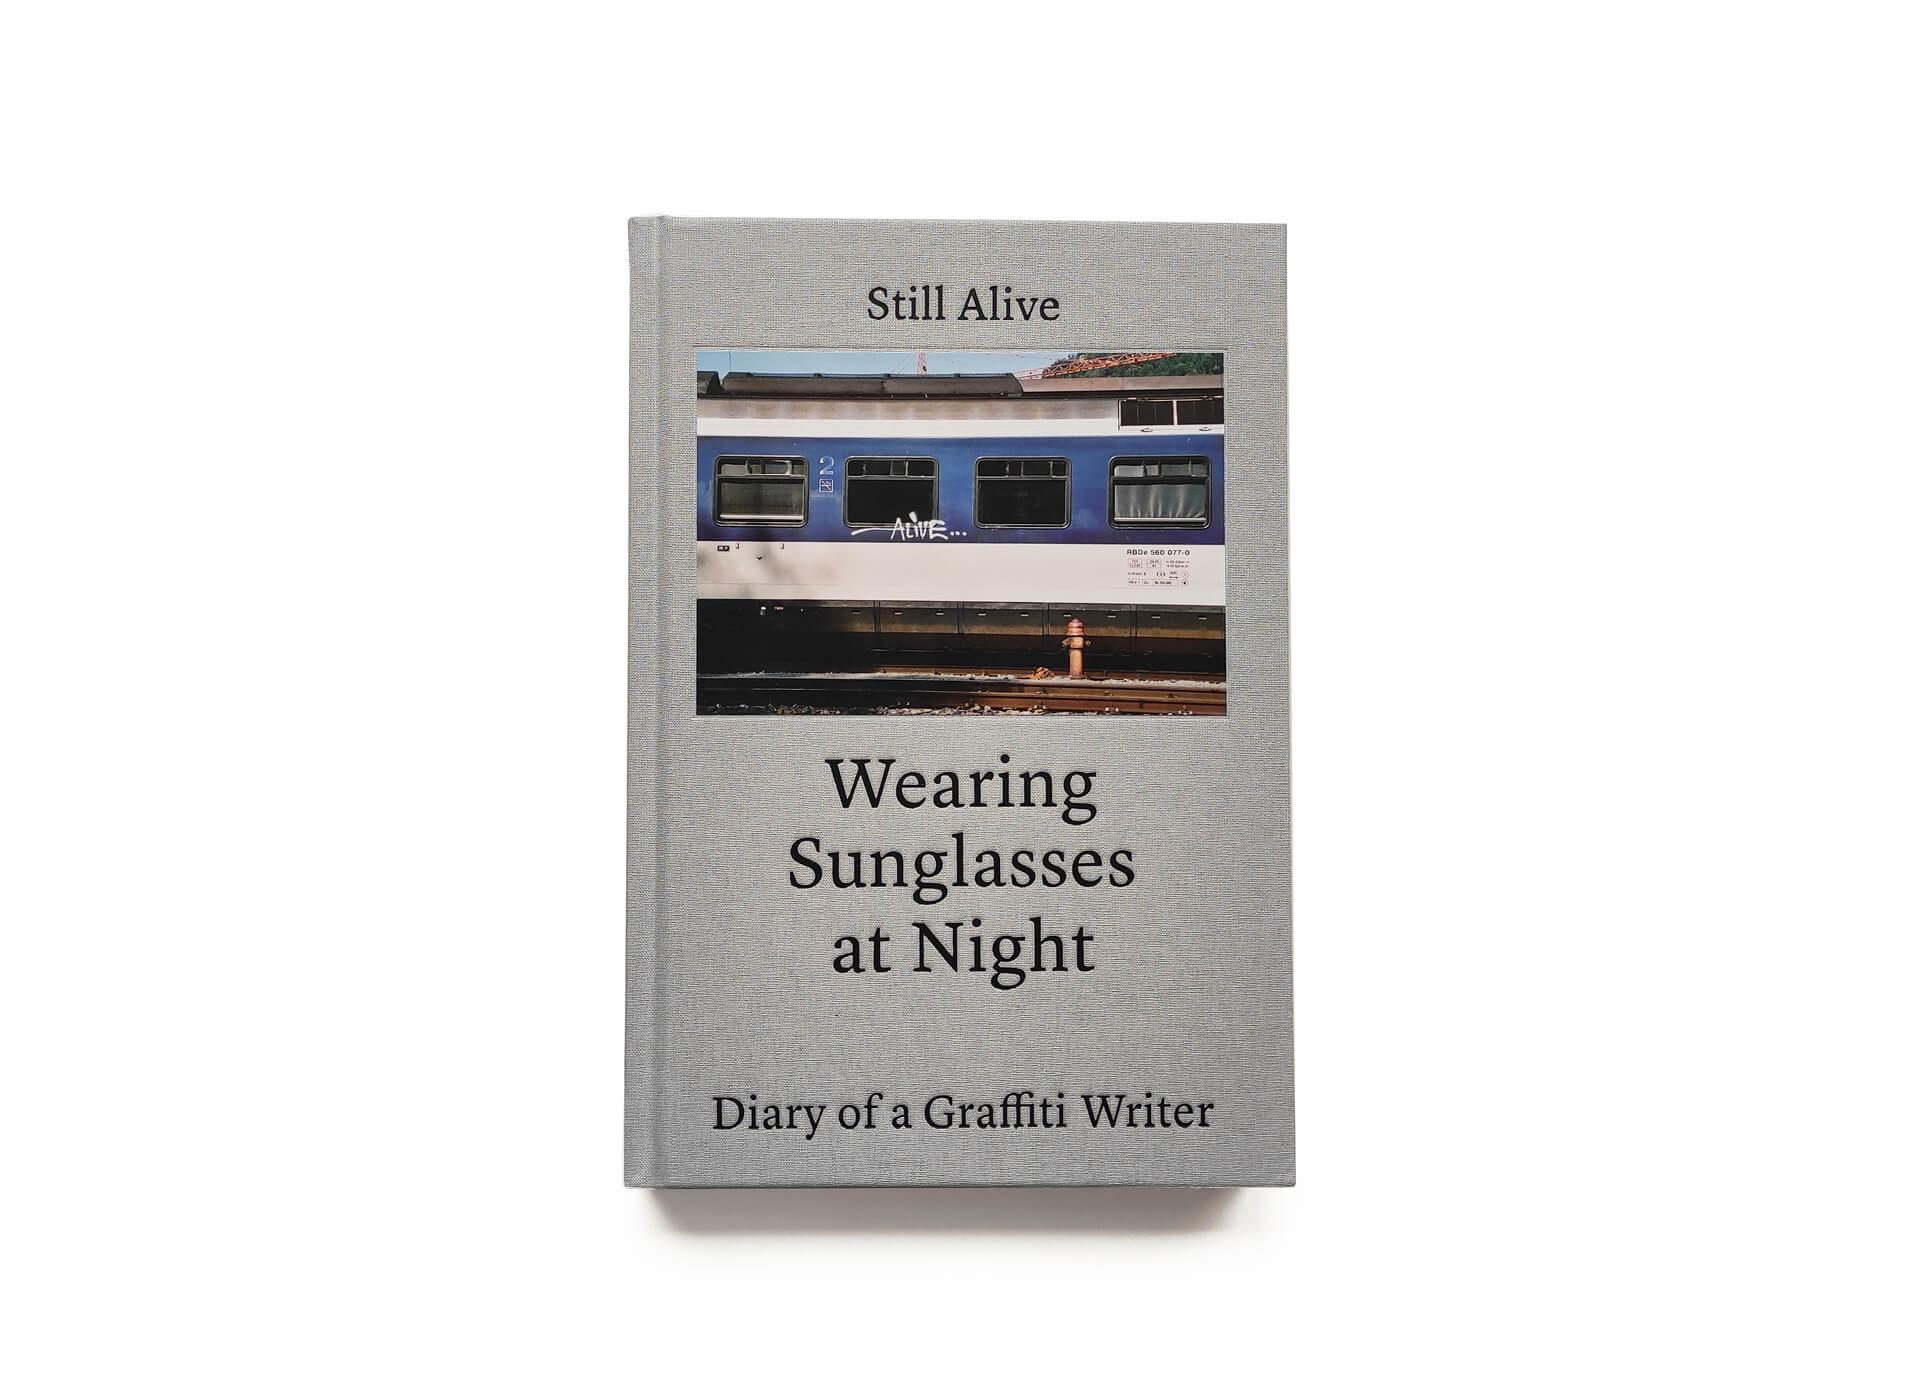 Still Alive - Wearing Sunglasses at Night - Diary of a Graffiti Writer